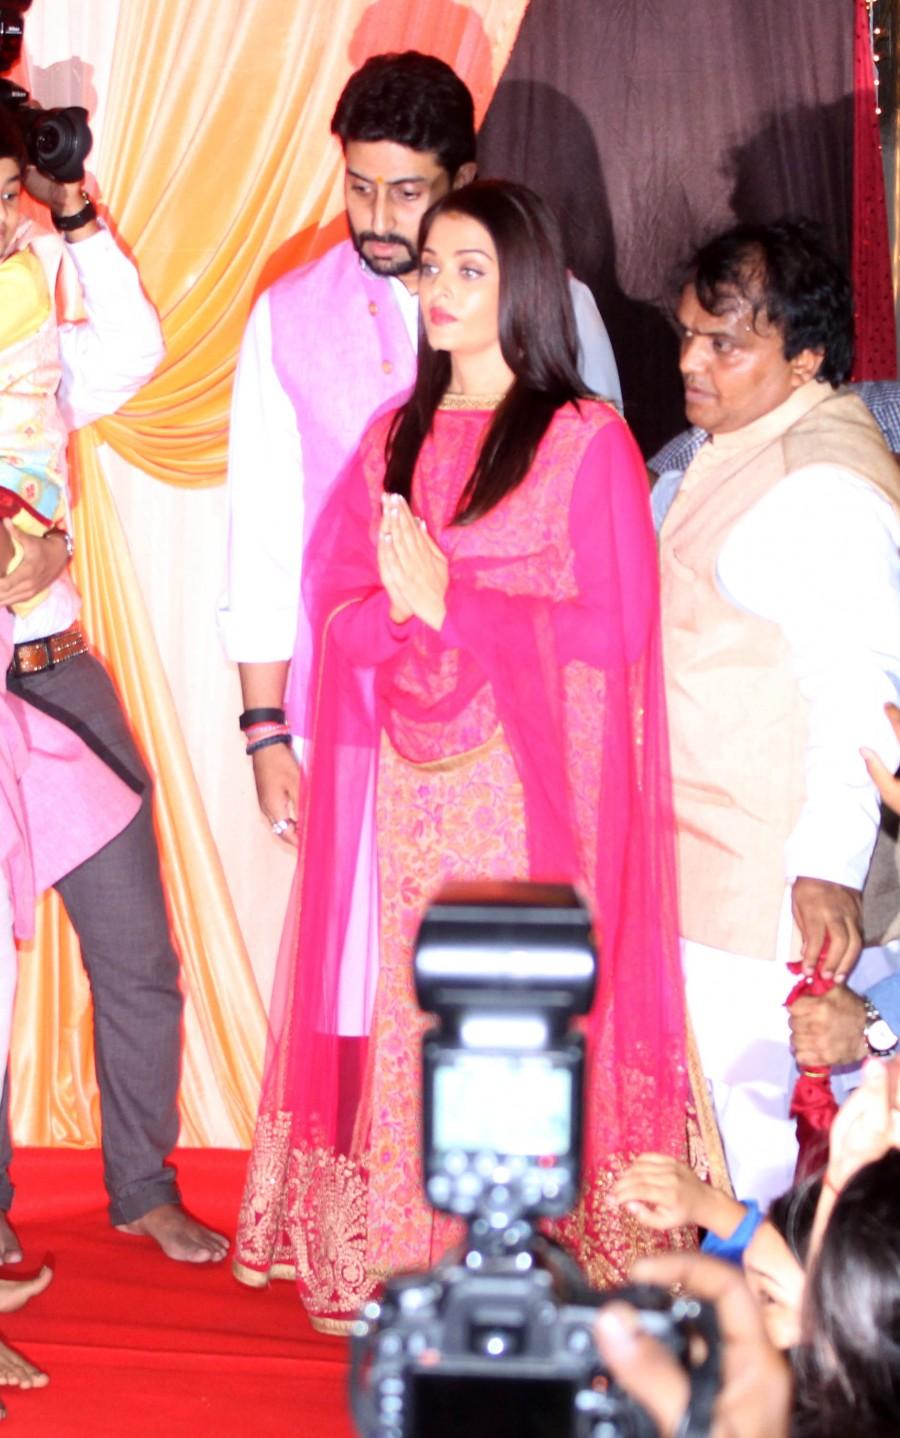 Abhishek Bachchan,Aishwarya Rai Bachchan,Aishwarya Rai,Abhishek Bachchan and Aishwarya Rai,Ganesh Chaturthi celebrations,Ganesh Chaturthi,ganesh chaturthi celebrations bollywood,Ganesh Chaturthi celebrations pics,Ganesh Chaturthi celebrations images,Ganes